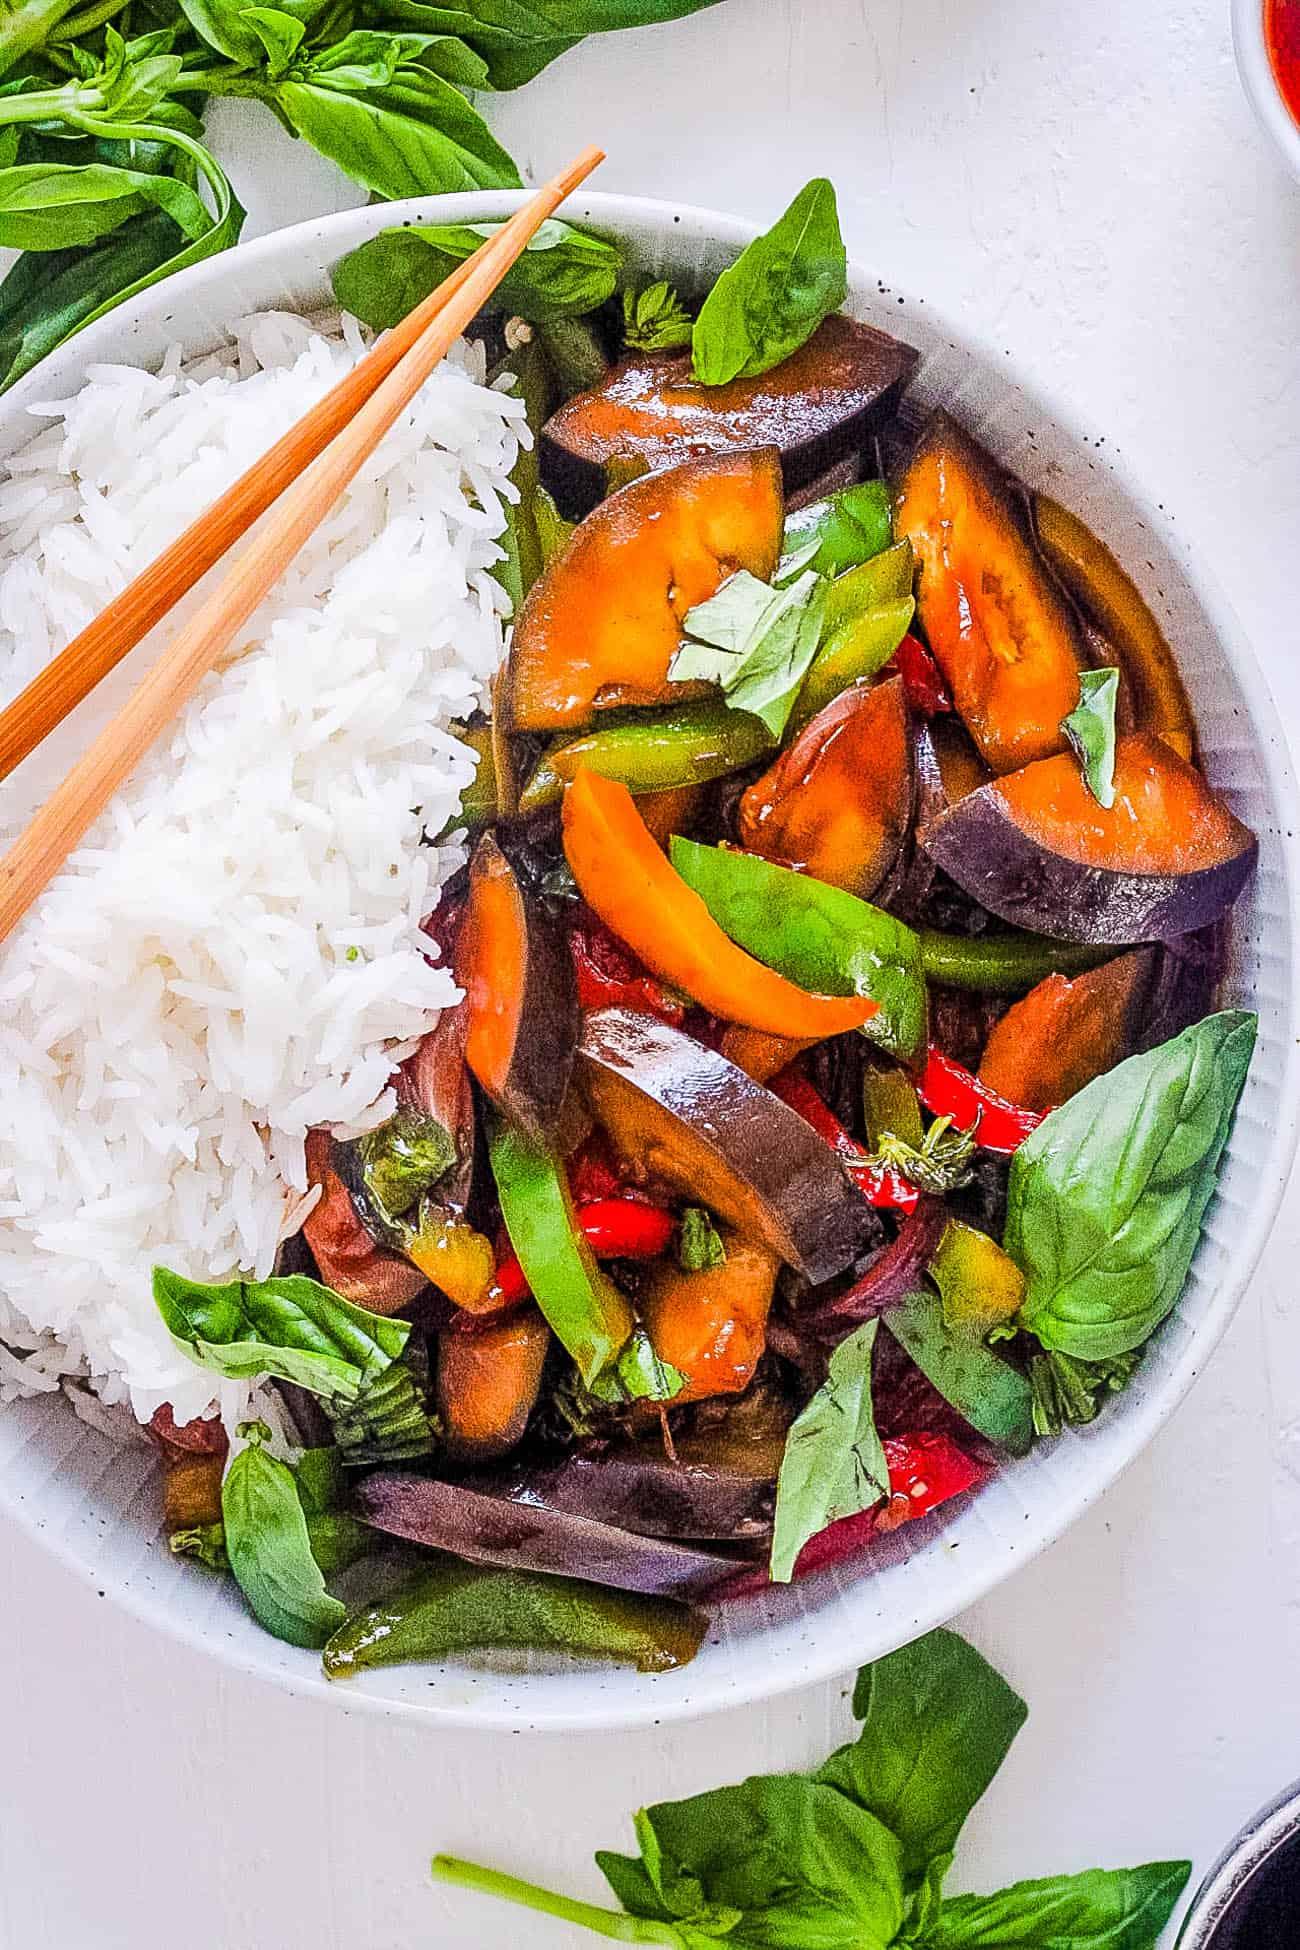 Thai Basil Eggplant Recipe (Vegan Stir Fry)